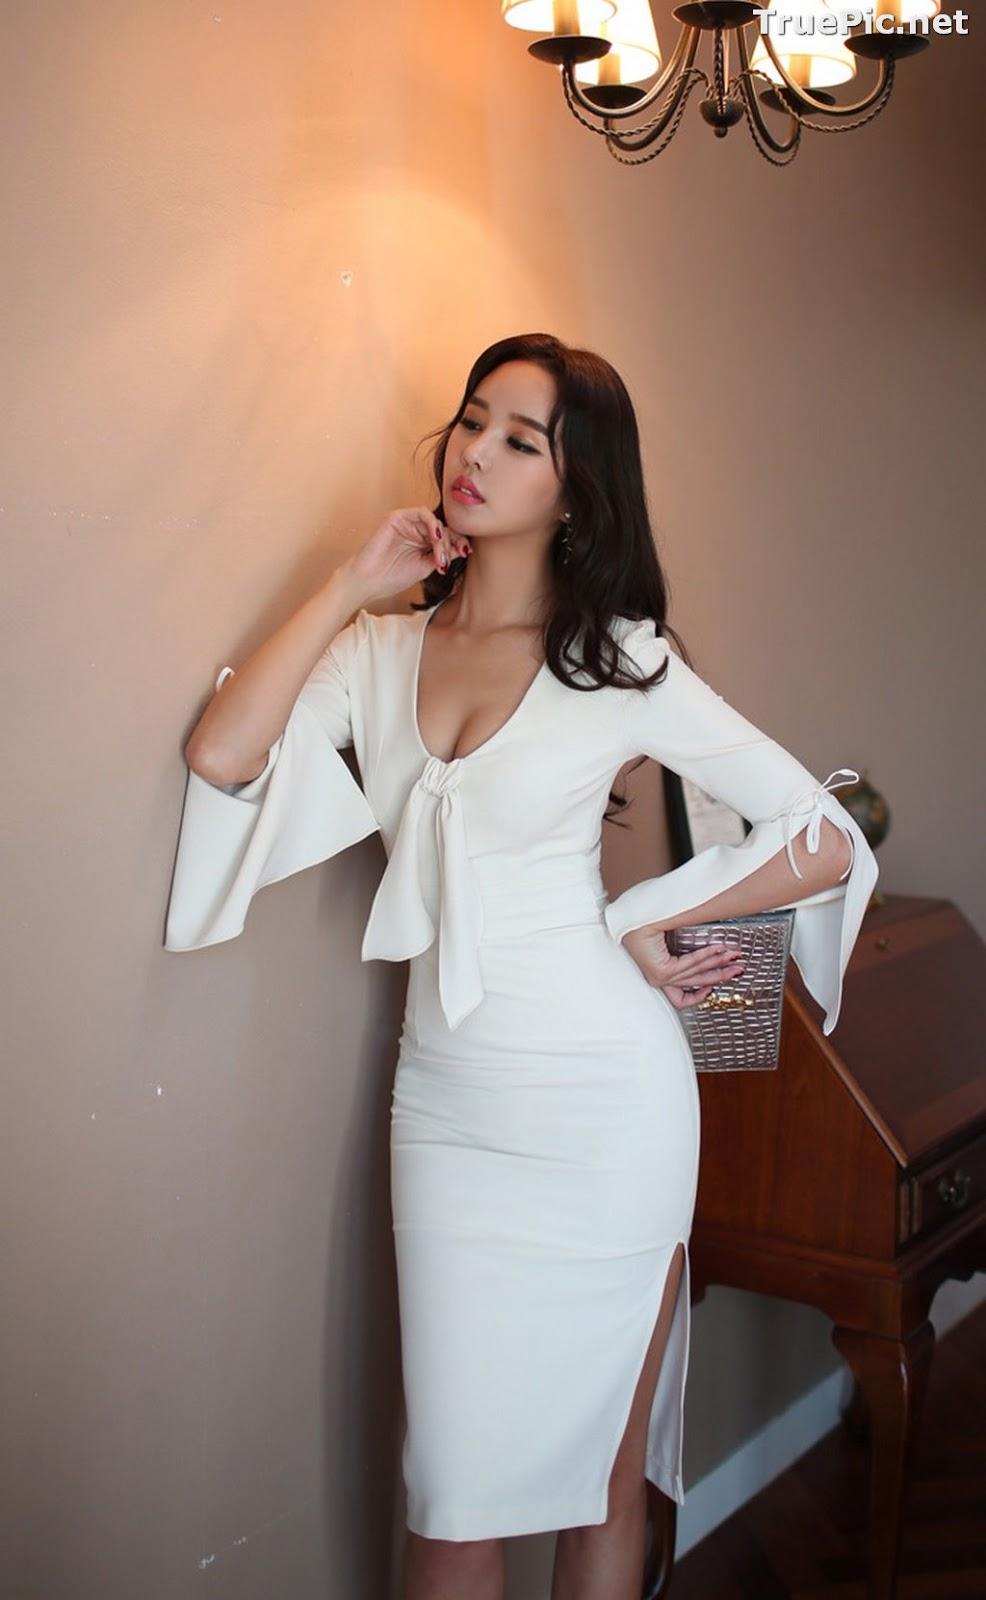 Image Korean Fashion Model - Chloe Kim - Fashion Photography Collection - TruePic.net - Picture-5